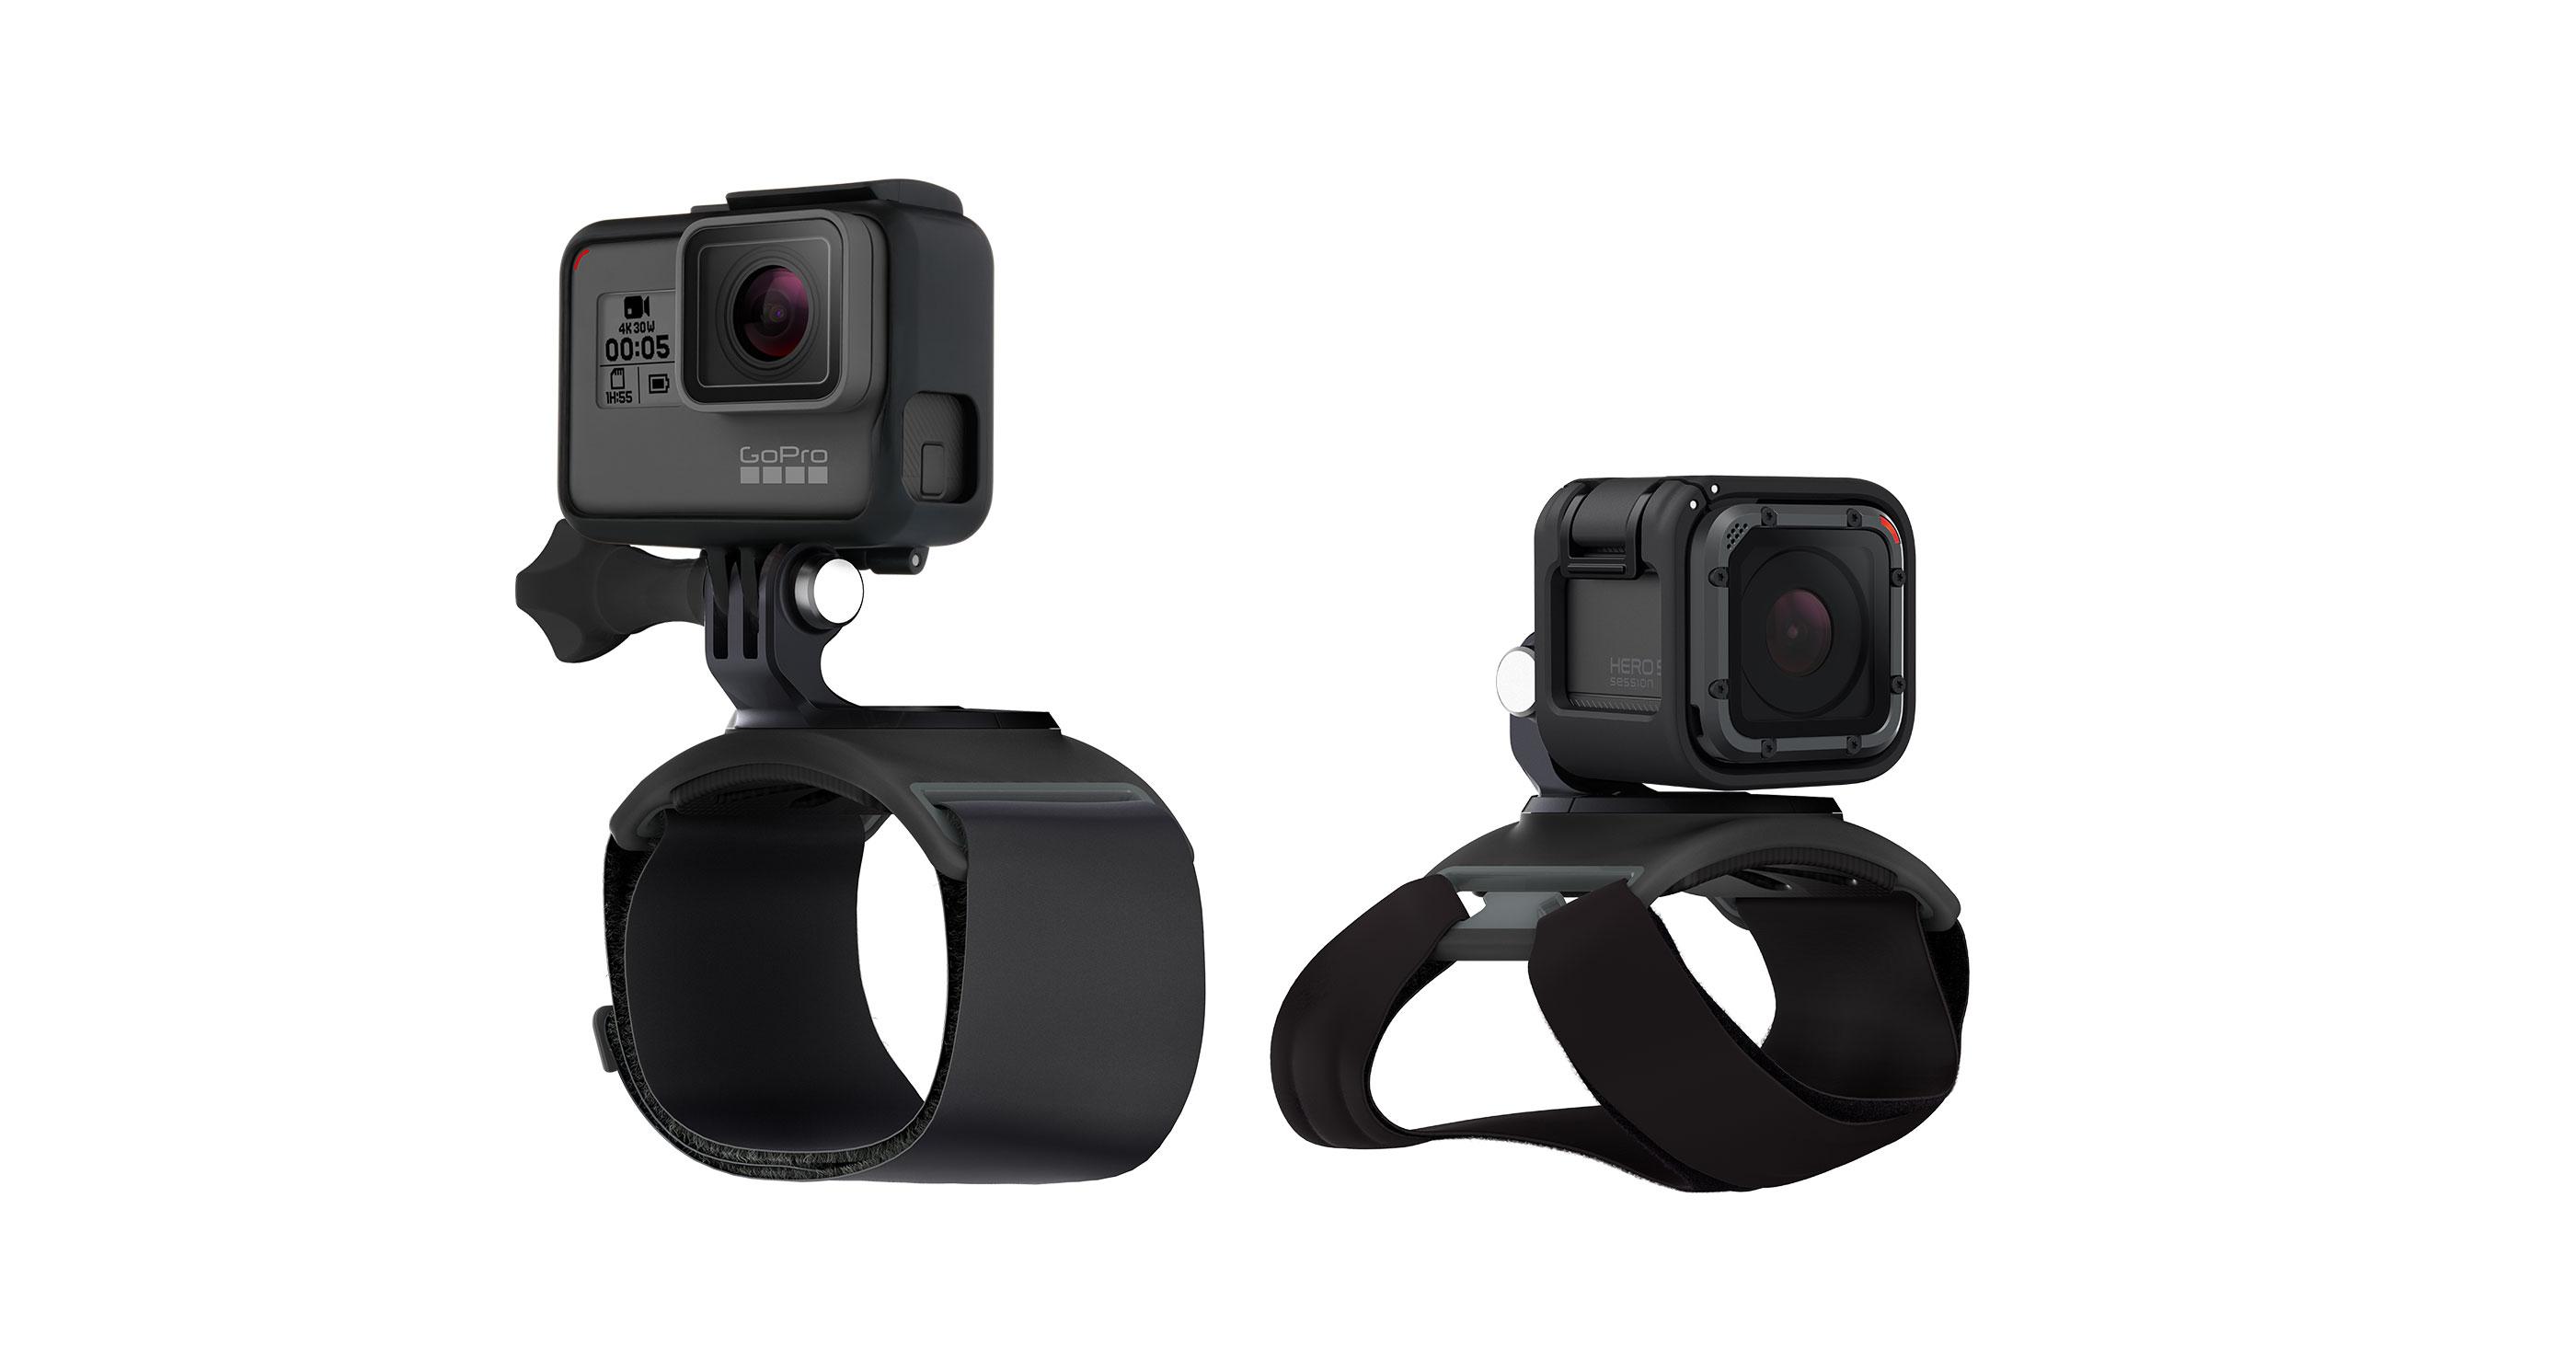 Banderola GoPro Hand + Wrist Strap AHWBM-002